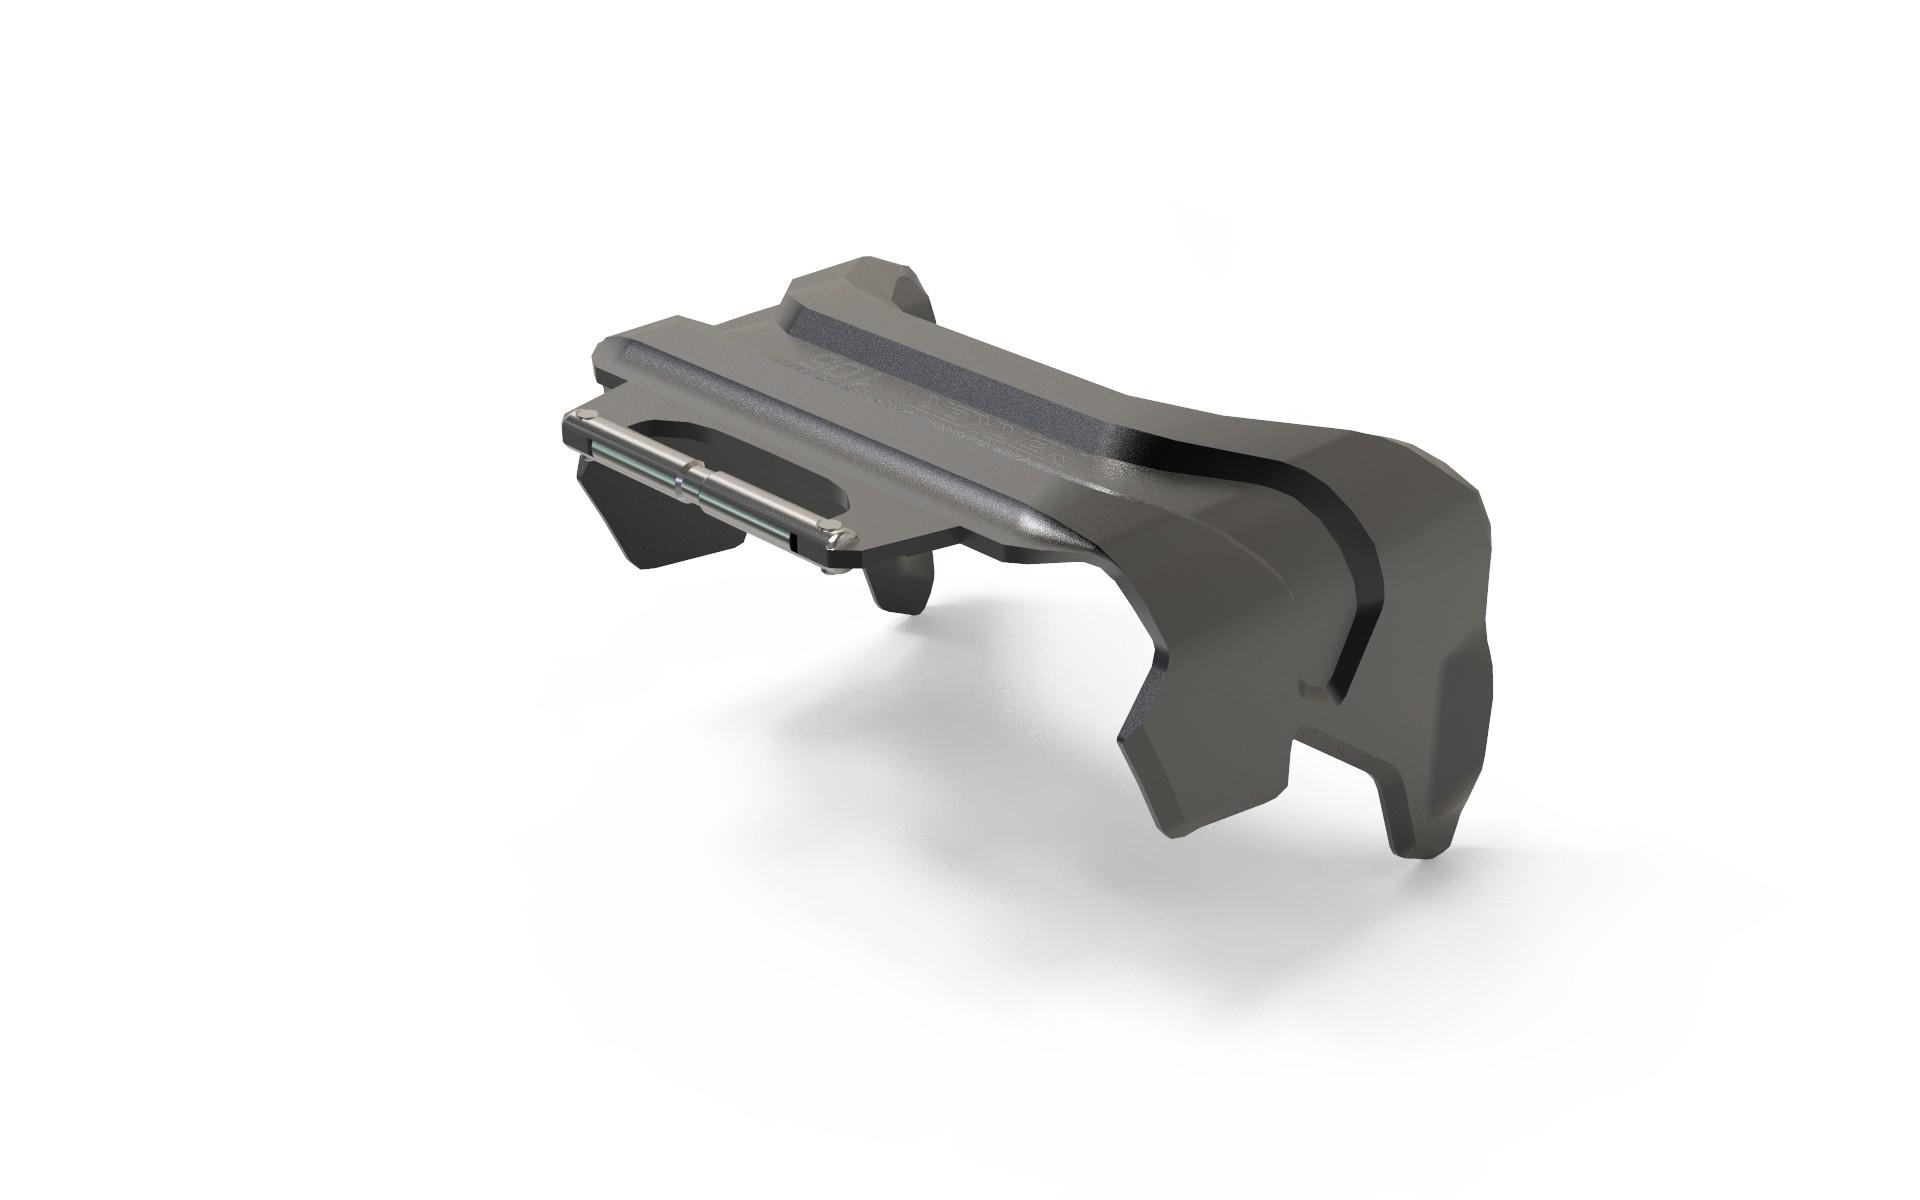 Crampon Pintech 105mm (ski width 90-105mm)